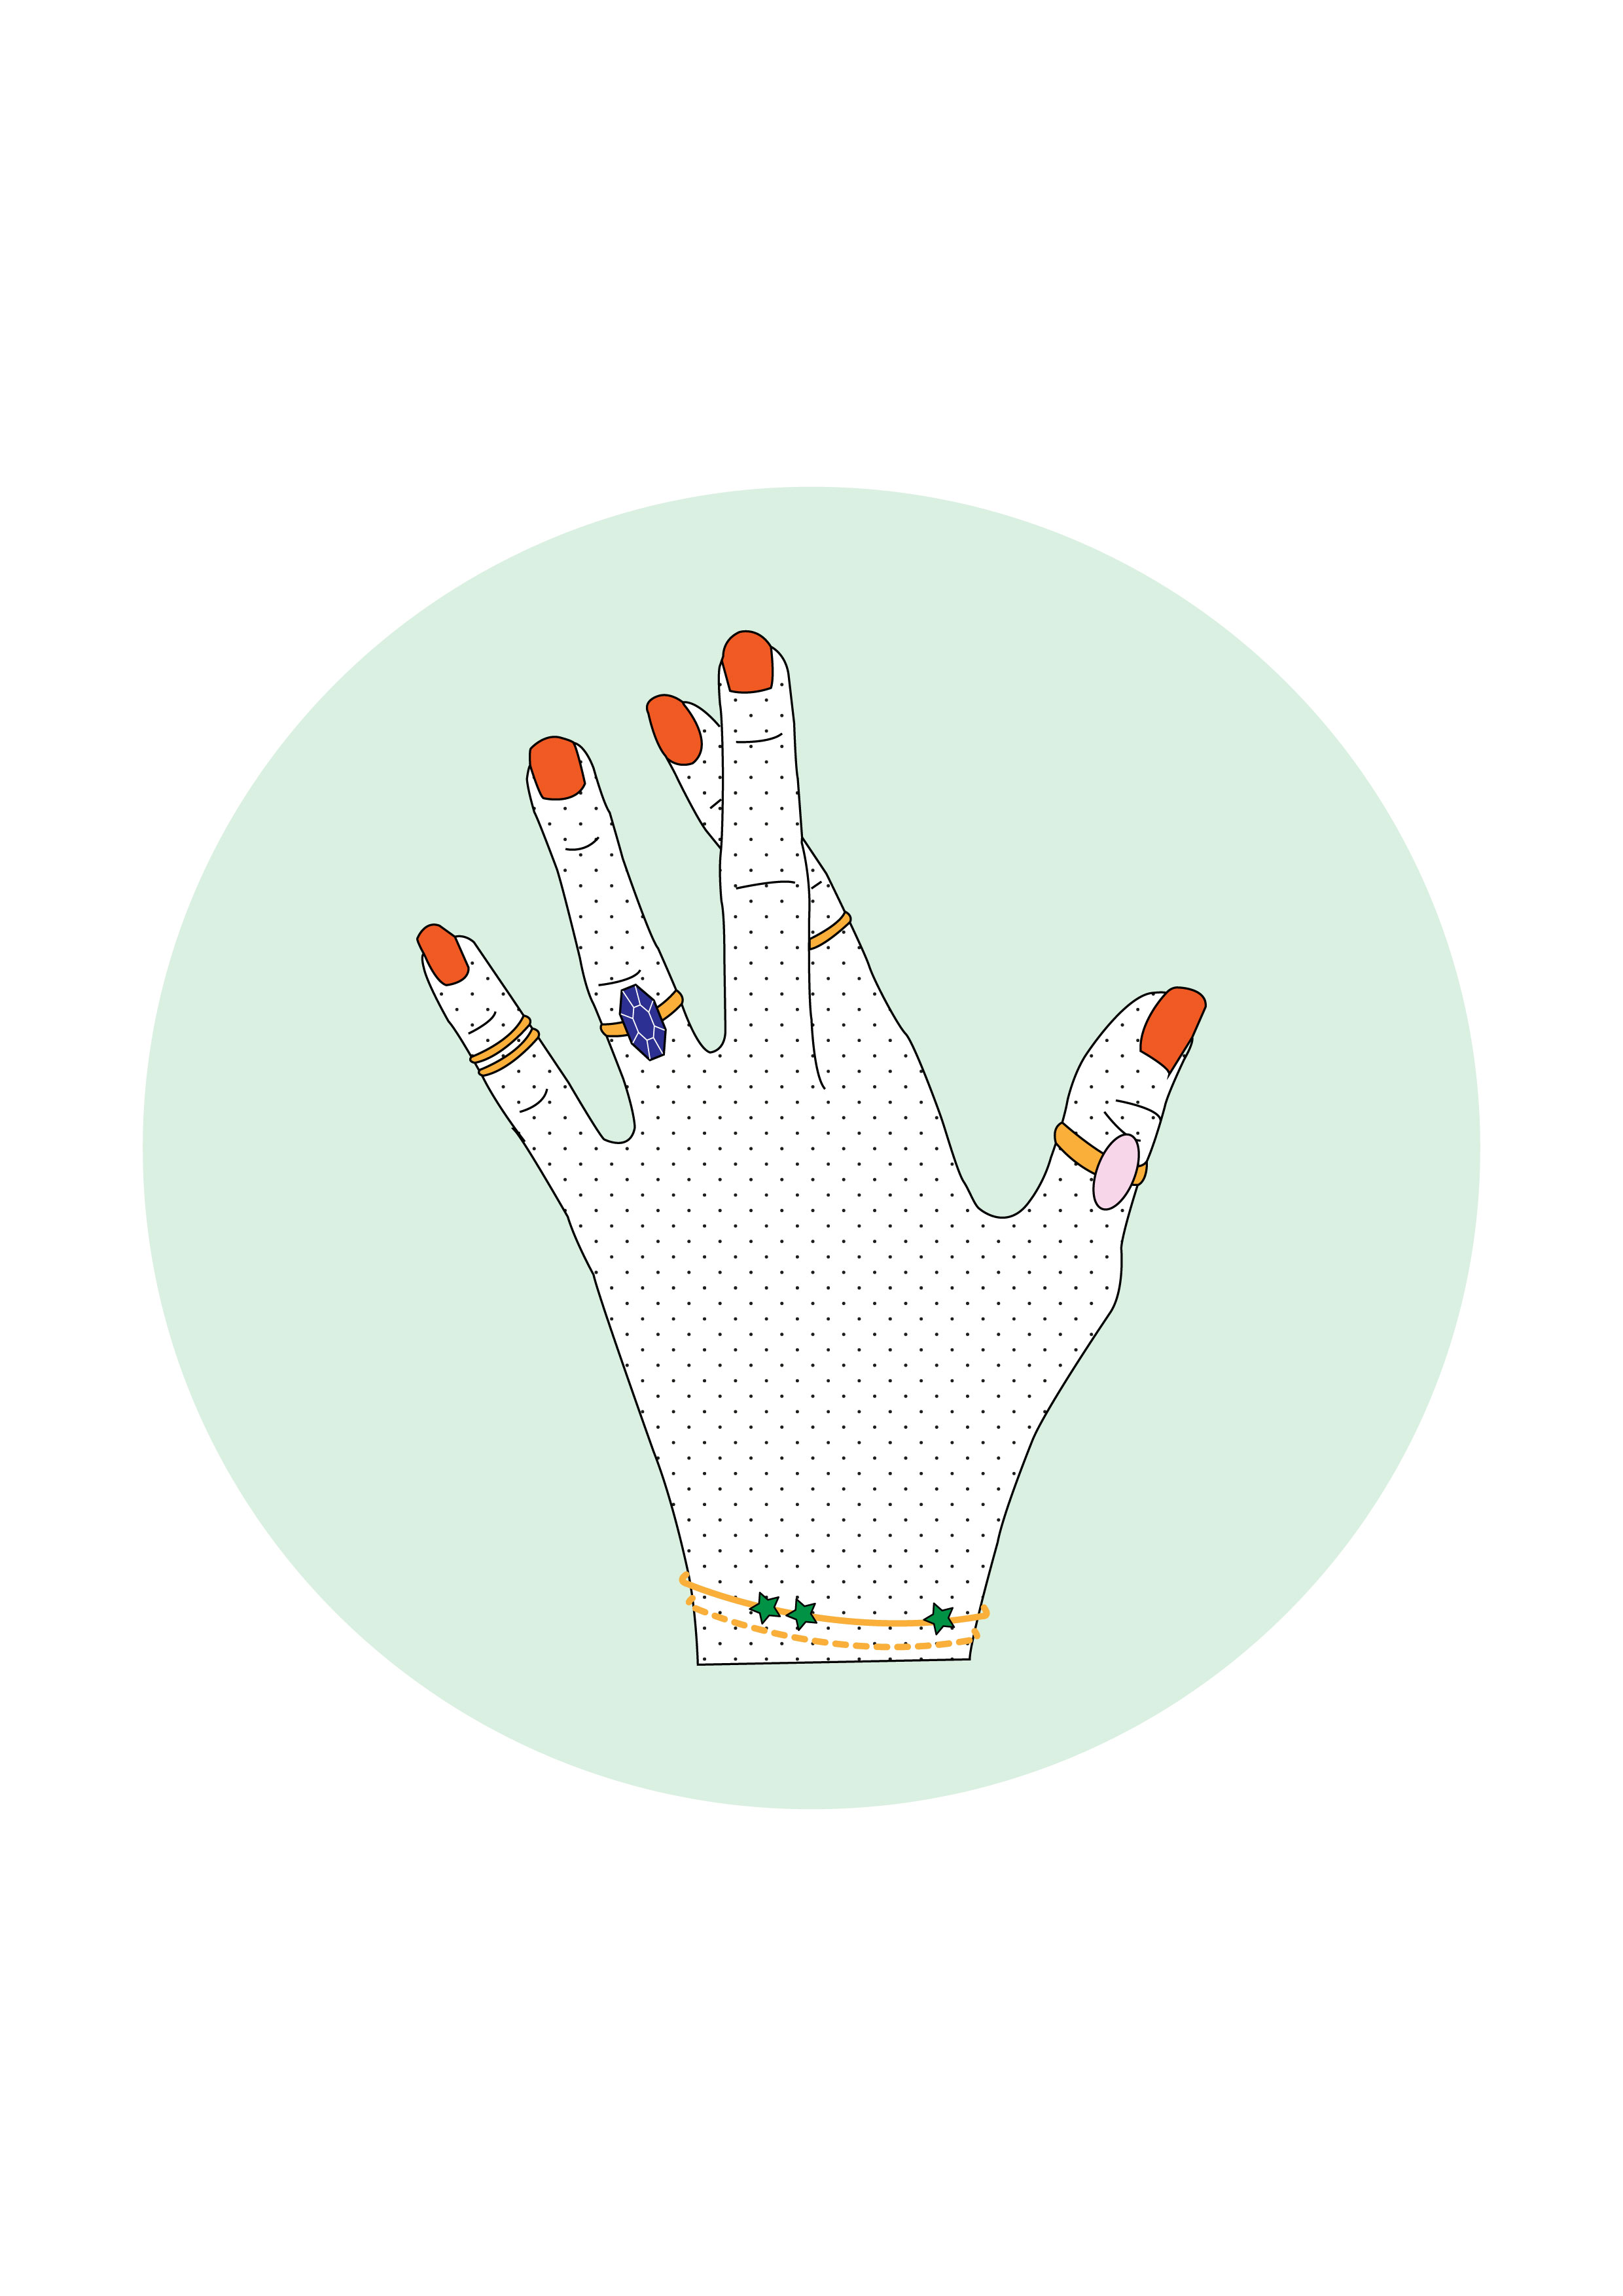 Fingers Crossed Logo Fingers-crossed